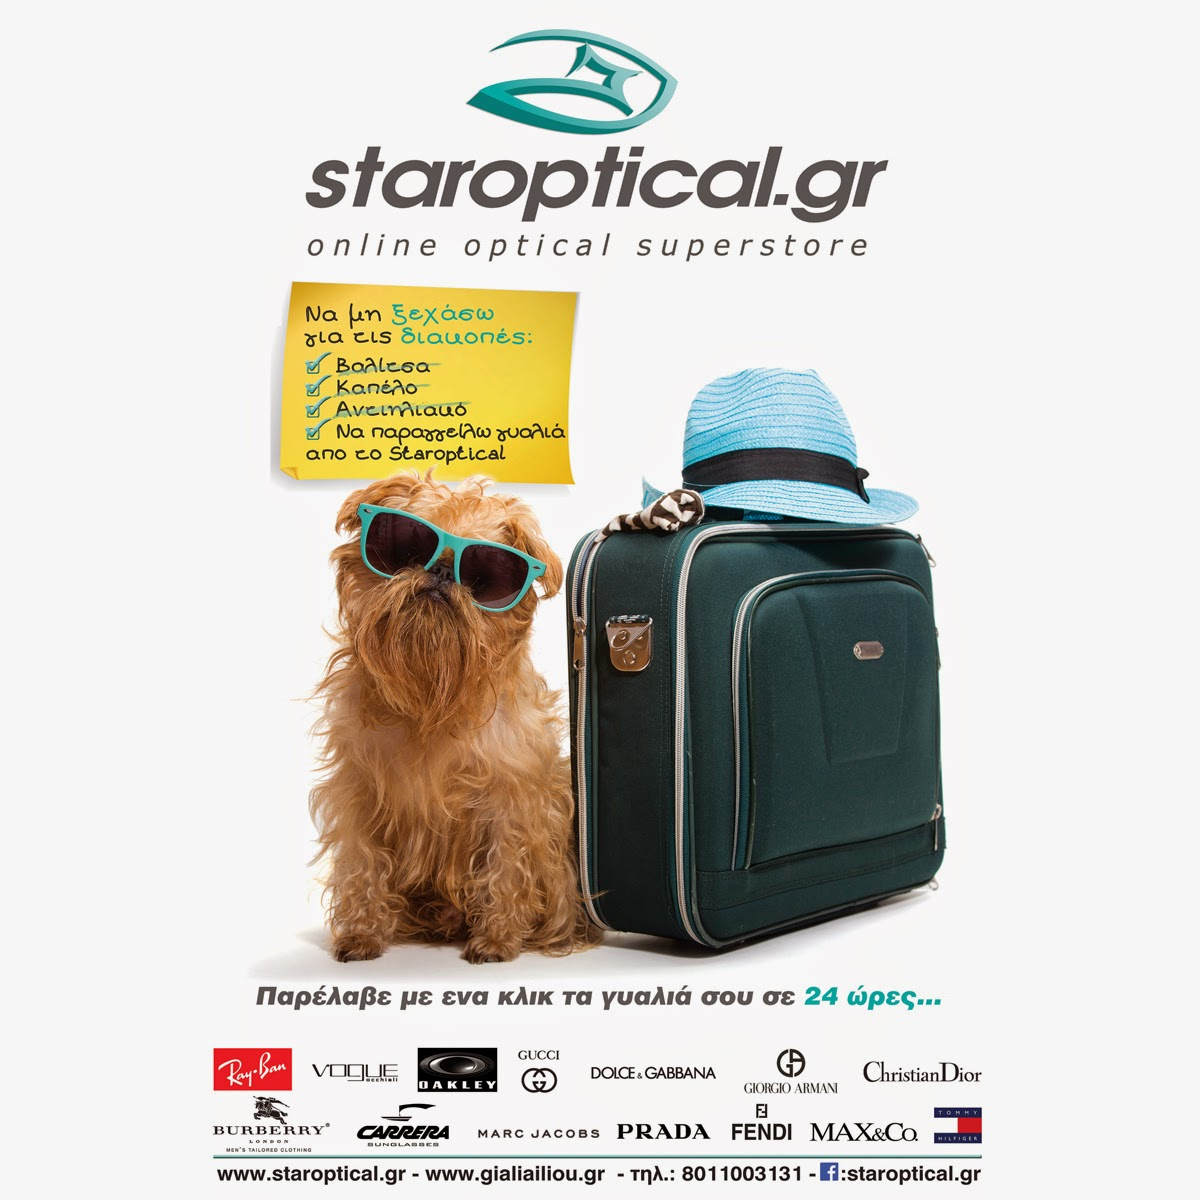 staroptical.gr blog - Γυαλιά Ηλίου - Γυαλιά Οράσεως - Φακοί Επαφής adb9d1da5a4